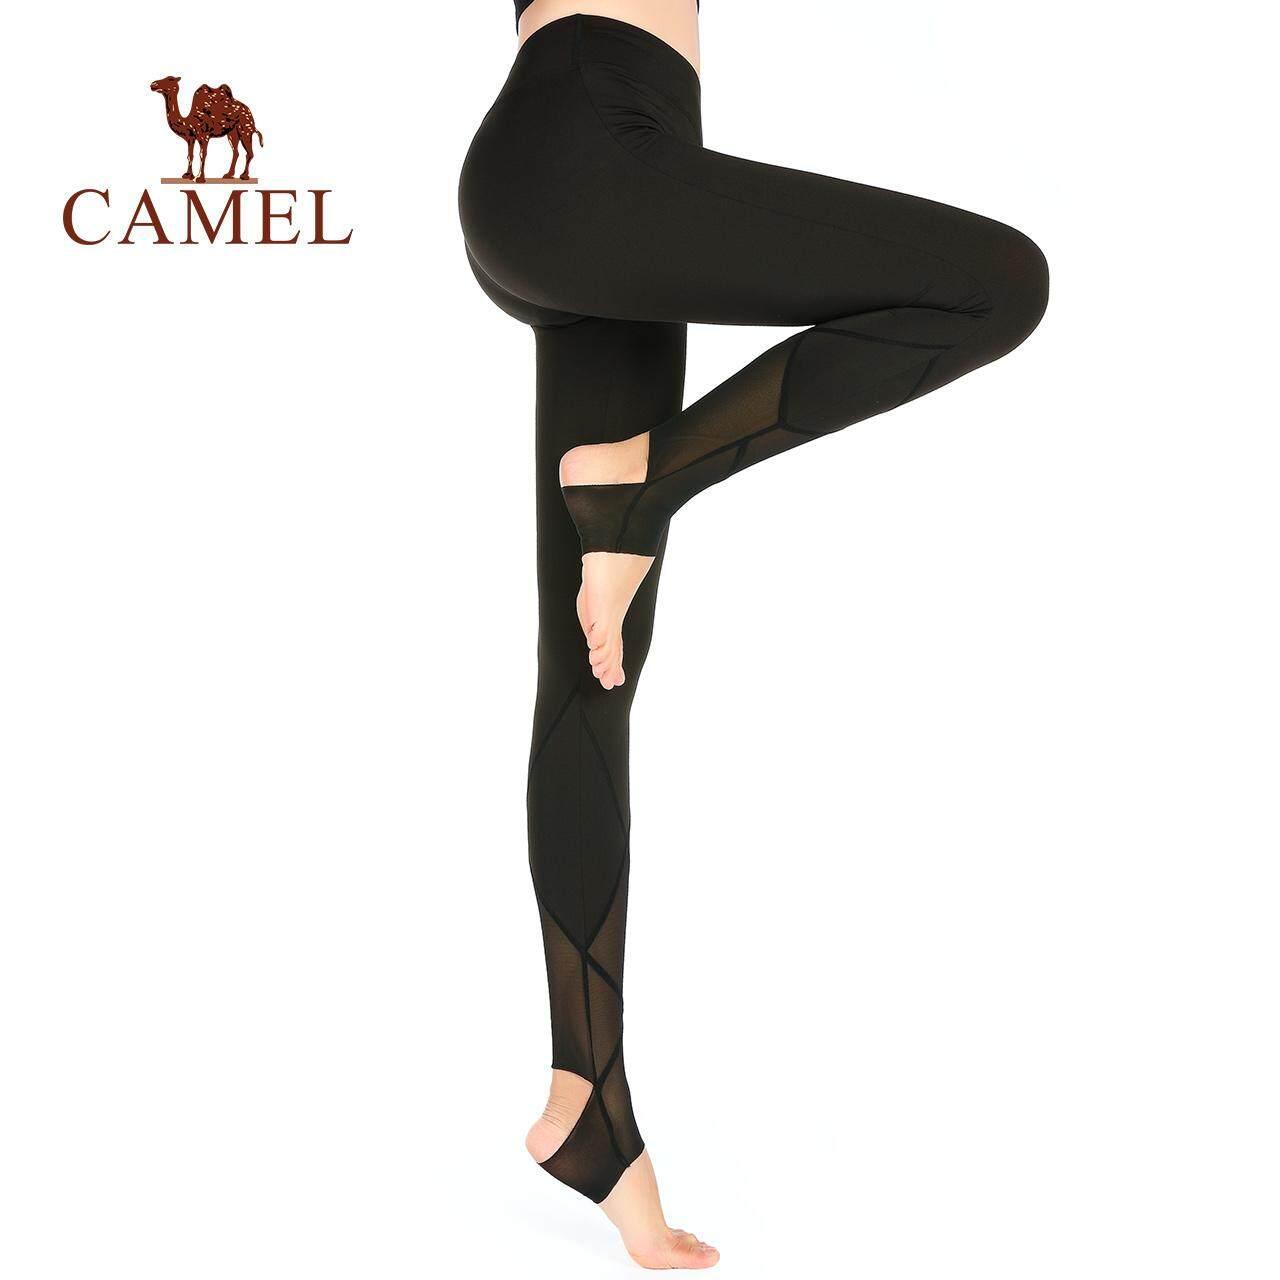 57358a100e232 CAMEL women sports trousers summer running fitness pants quick-drying yoga  pants stepping feet high